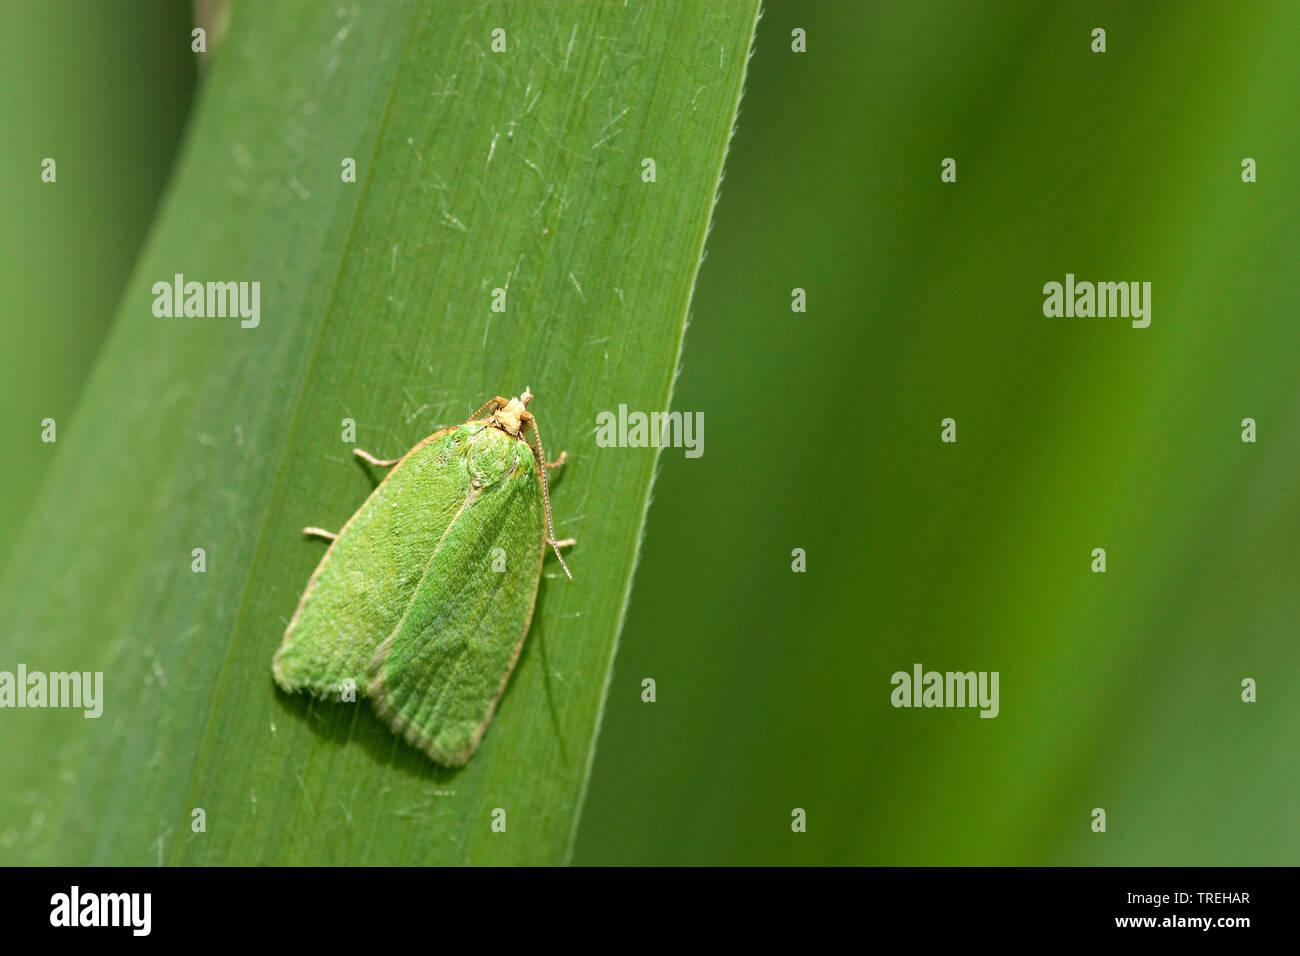 Gruener Eichenwickler (Tortrix viridana), sitzt auf einem Blatt, Niederlande, Noord-Brabant | pea-green oak curl, green oak tortrix, oak leafroller, g - Stock Image